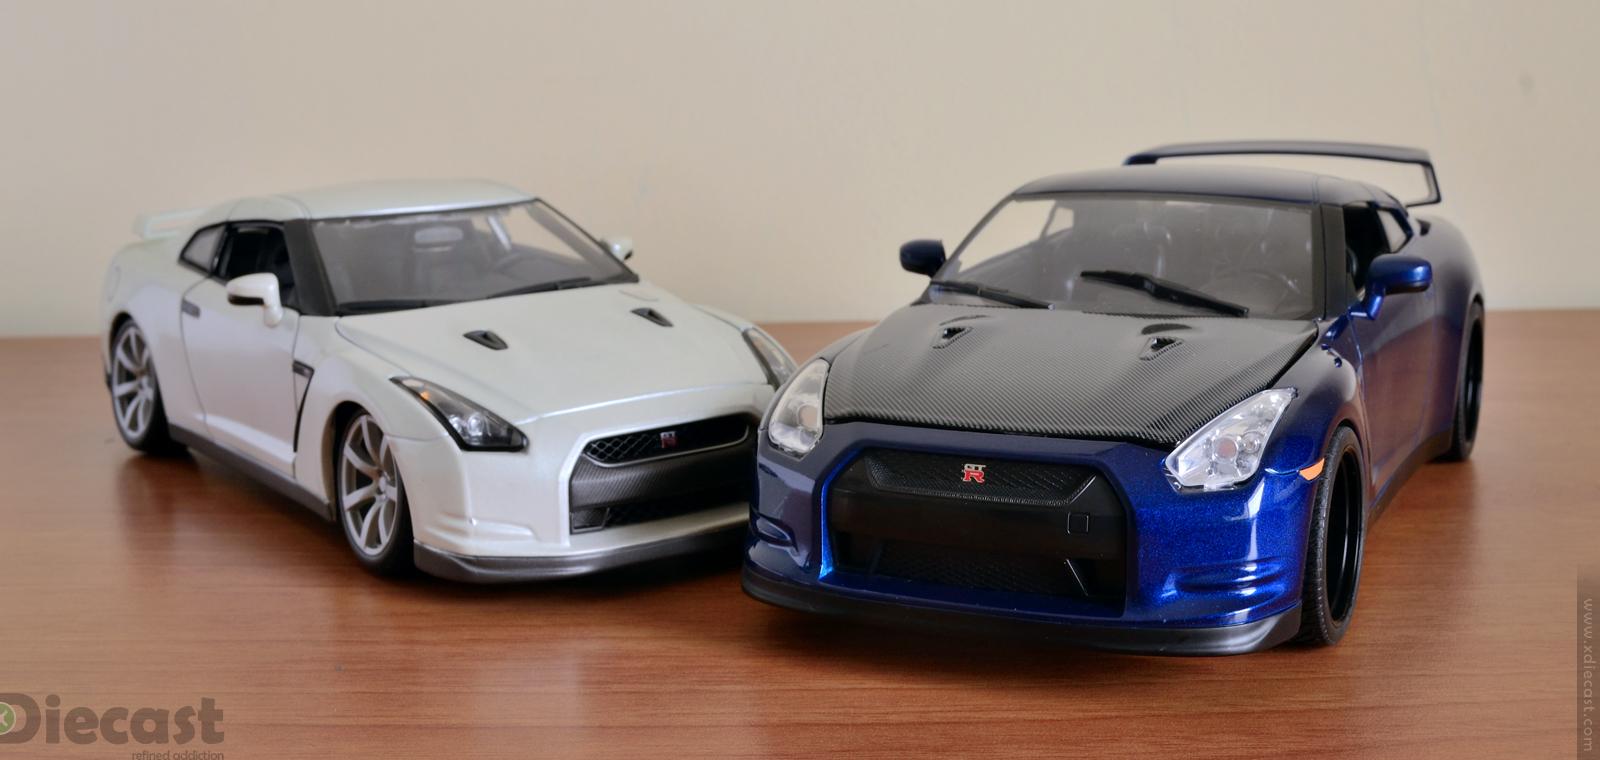 Jada Toys Brian's Nissan GT-R R35 vs Bburago Nissan GT-R